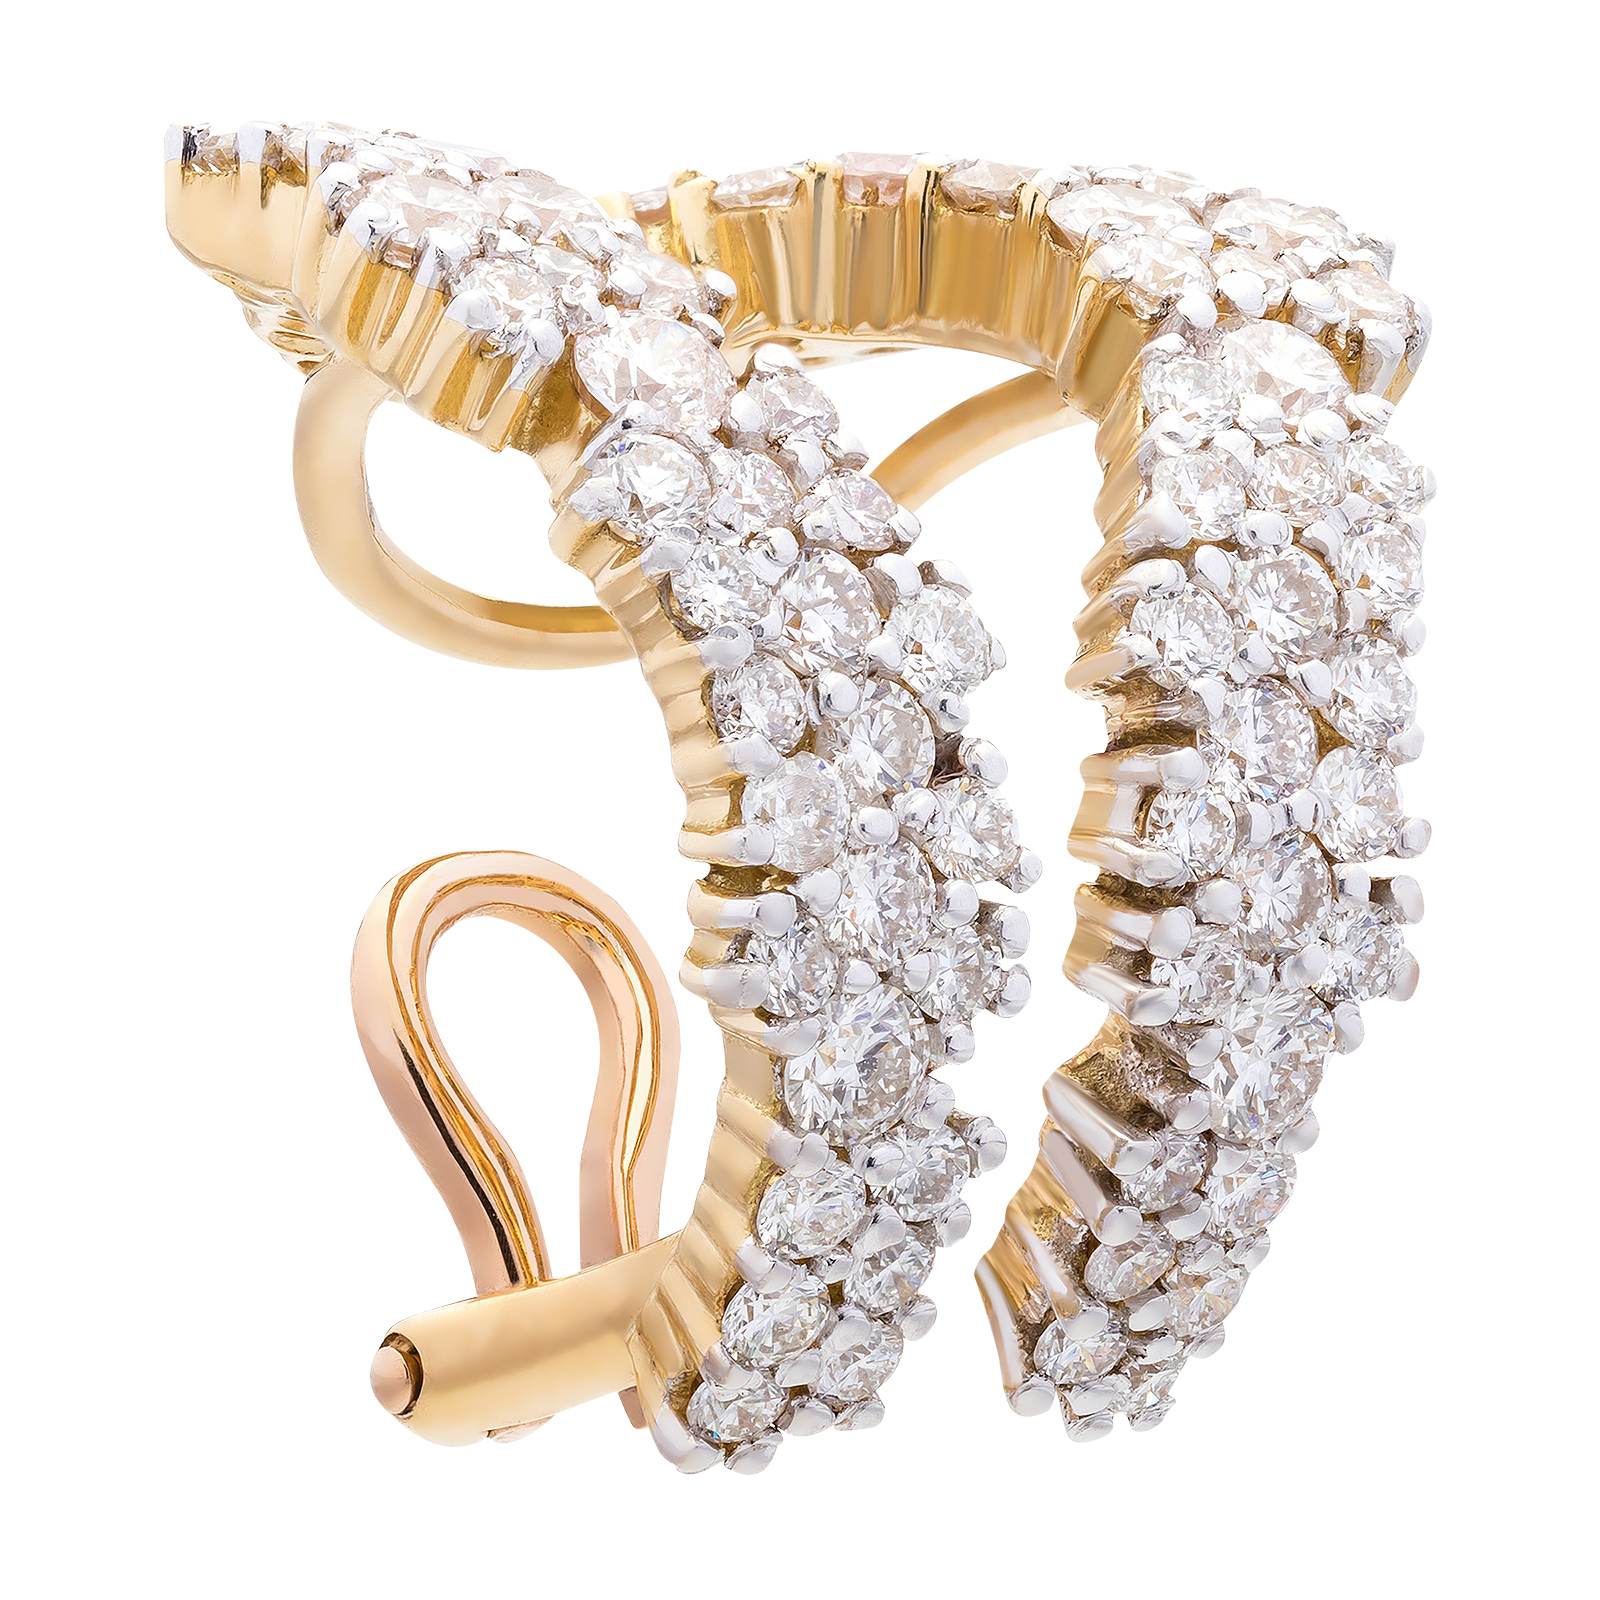 Diamond earring product photo